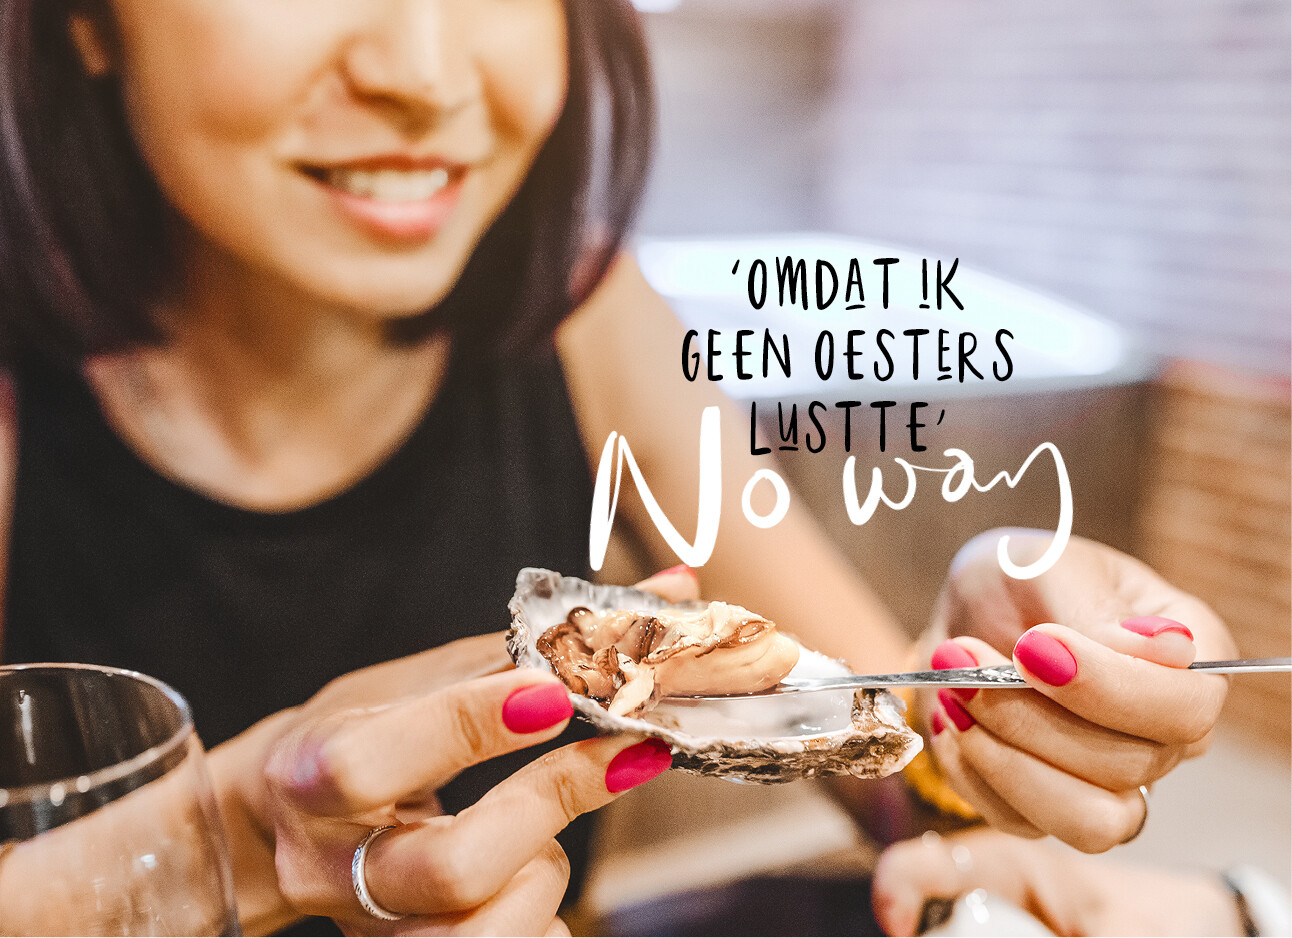 vrouw eet oesters